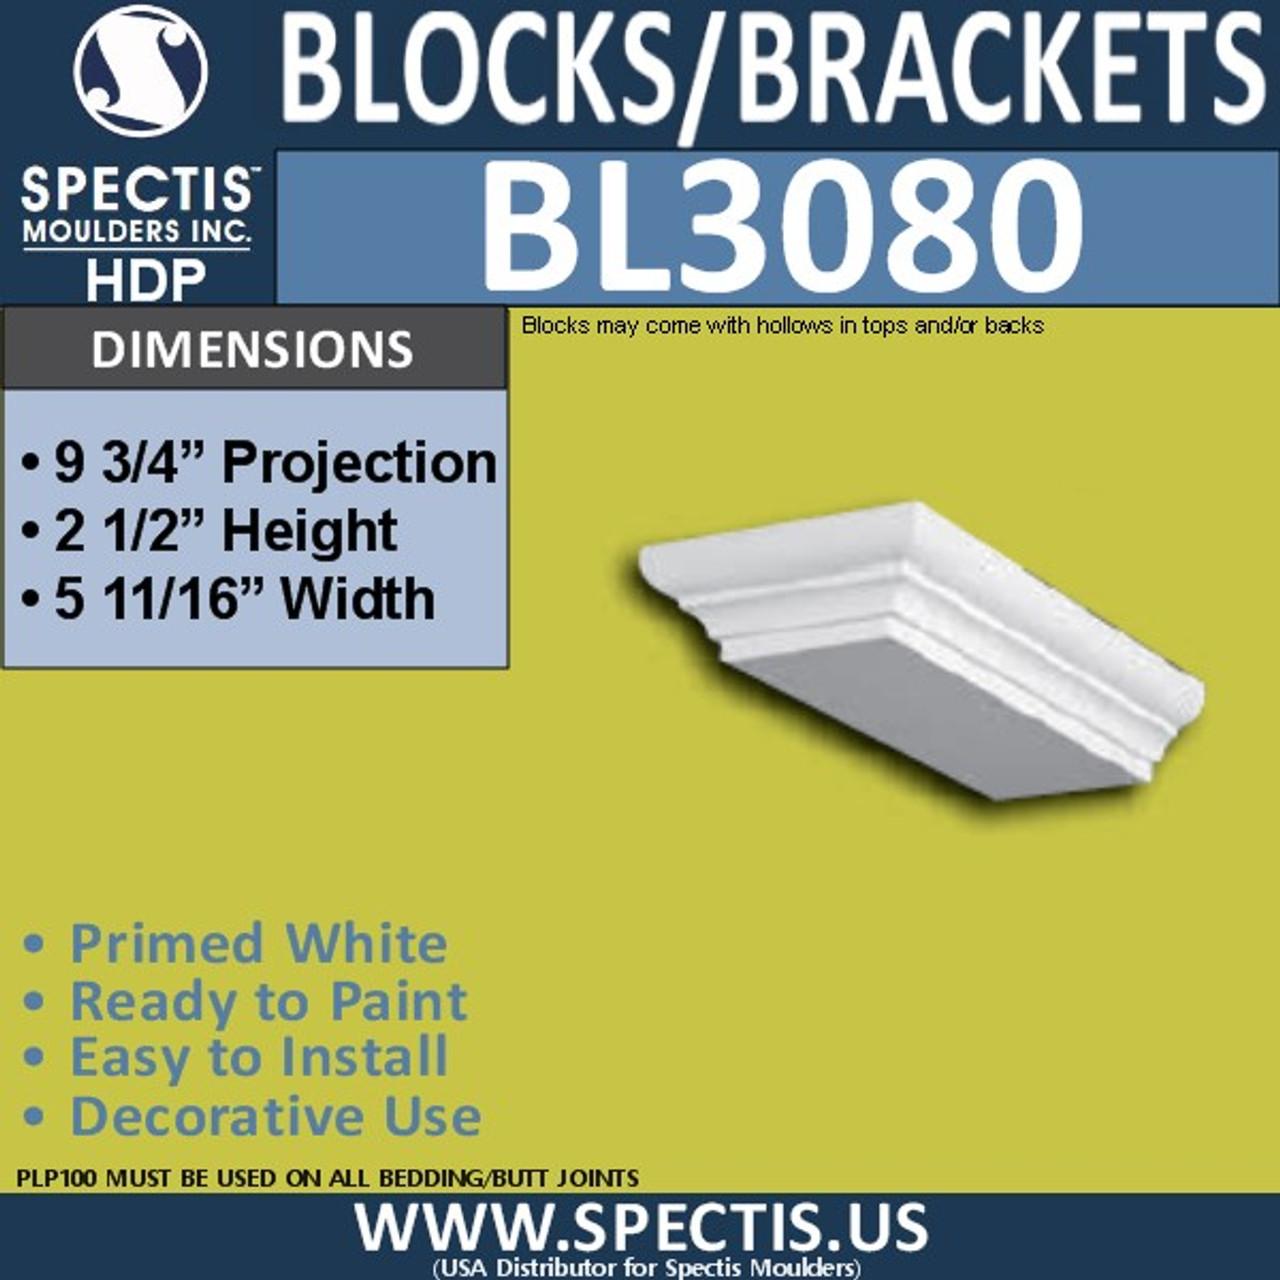 "BL3080 Eave Block or Bracket 5.5""W x 2.5""H x 9.75"" P"